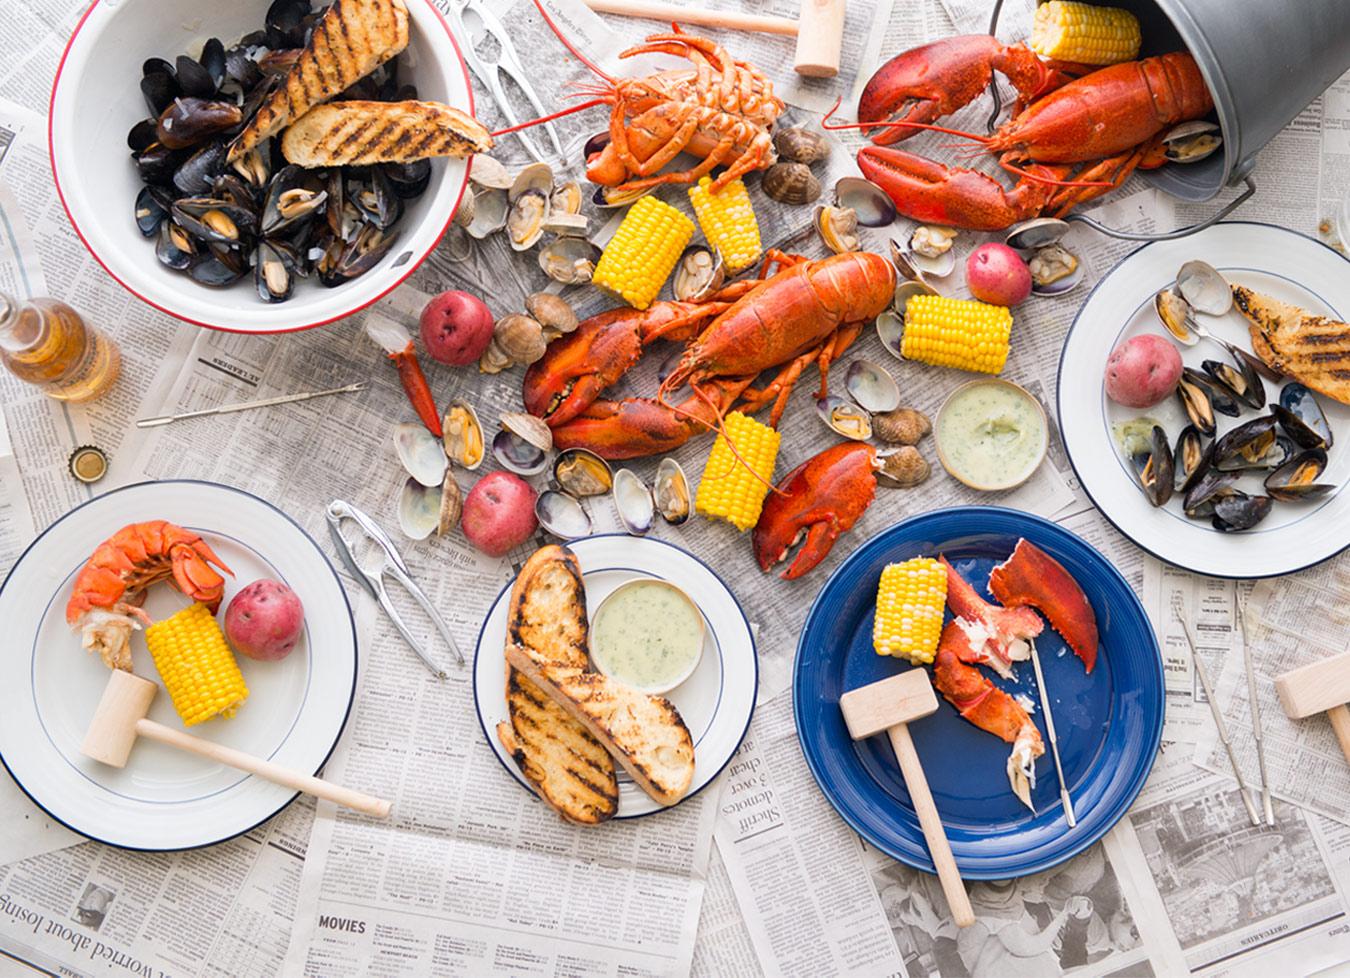 clam bakes 조개 구이 happen in the summer 여름 on the beach ...